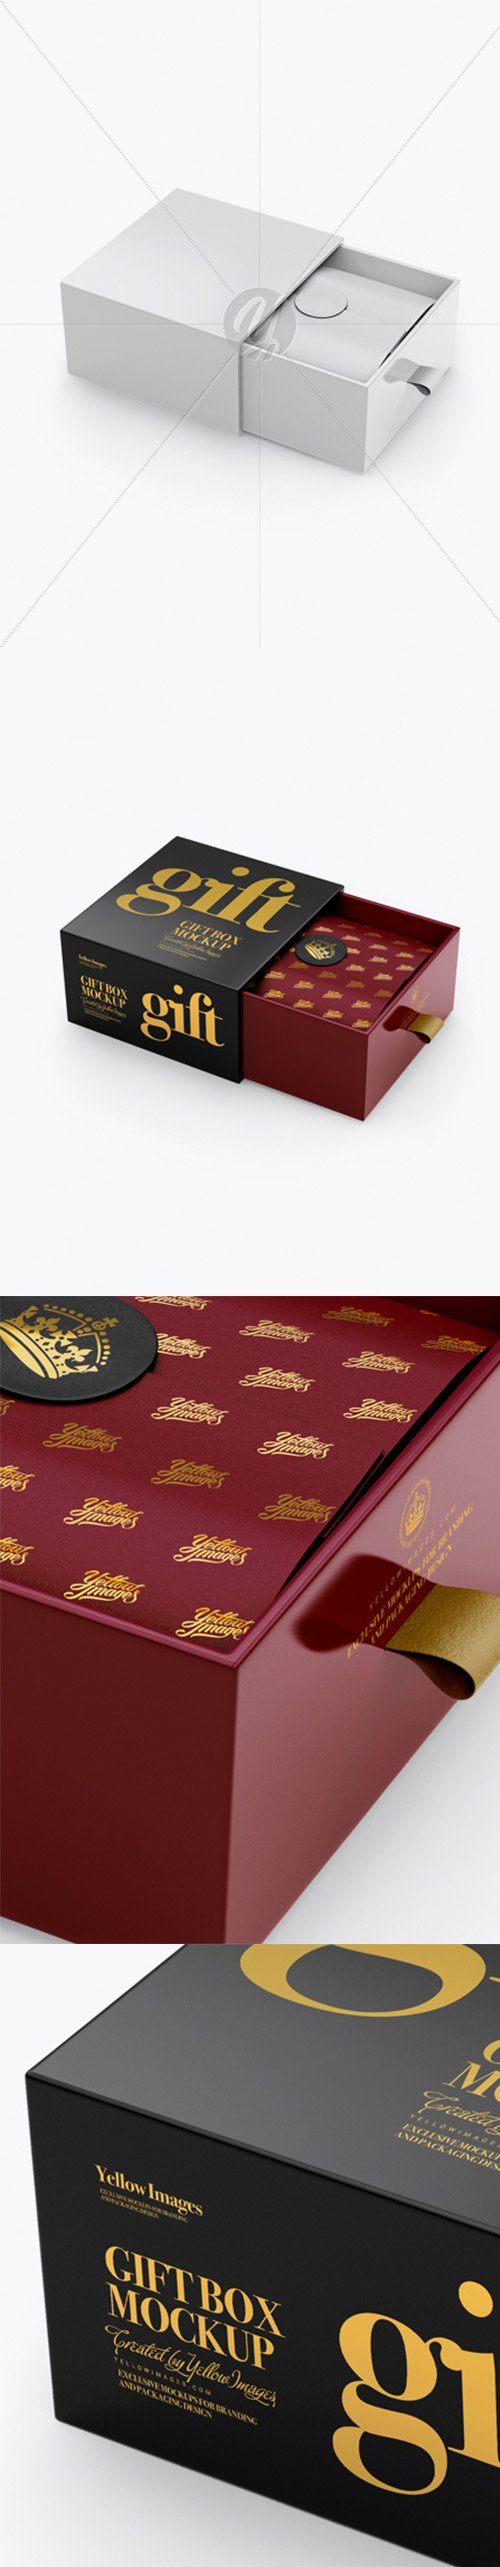 Opened Glossy Gift Box Mockup - Half Side View (High-Angle Shot) 22324 TIF